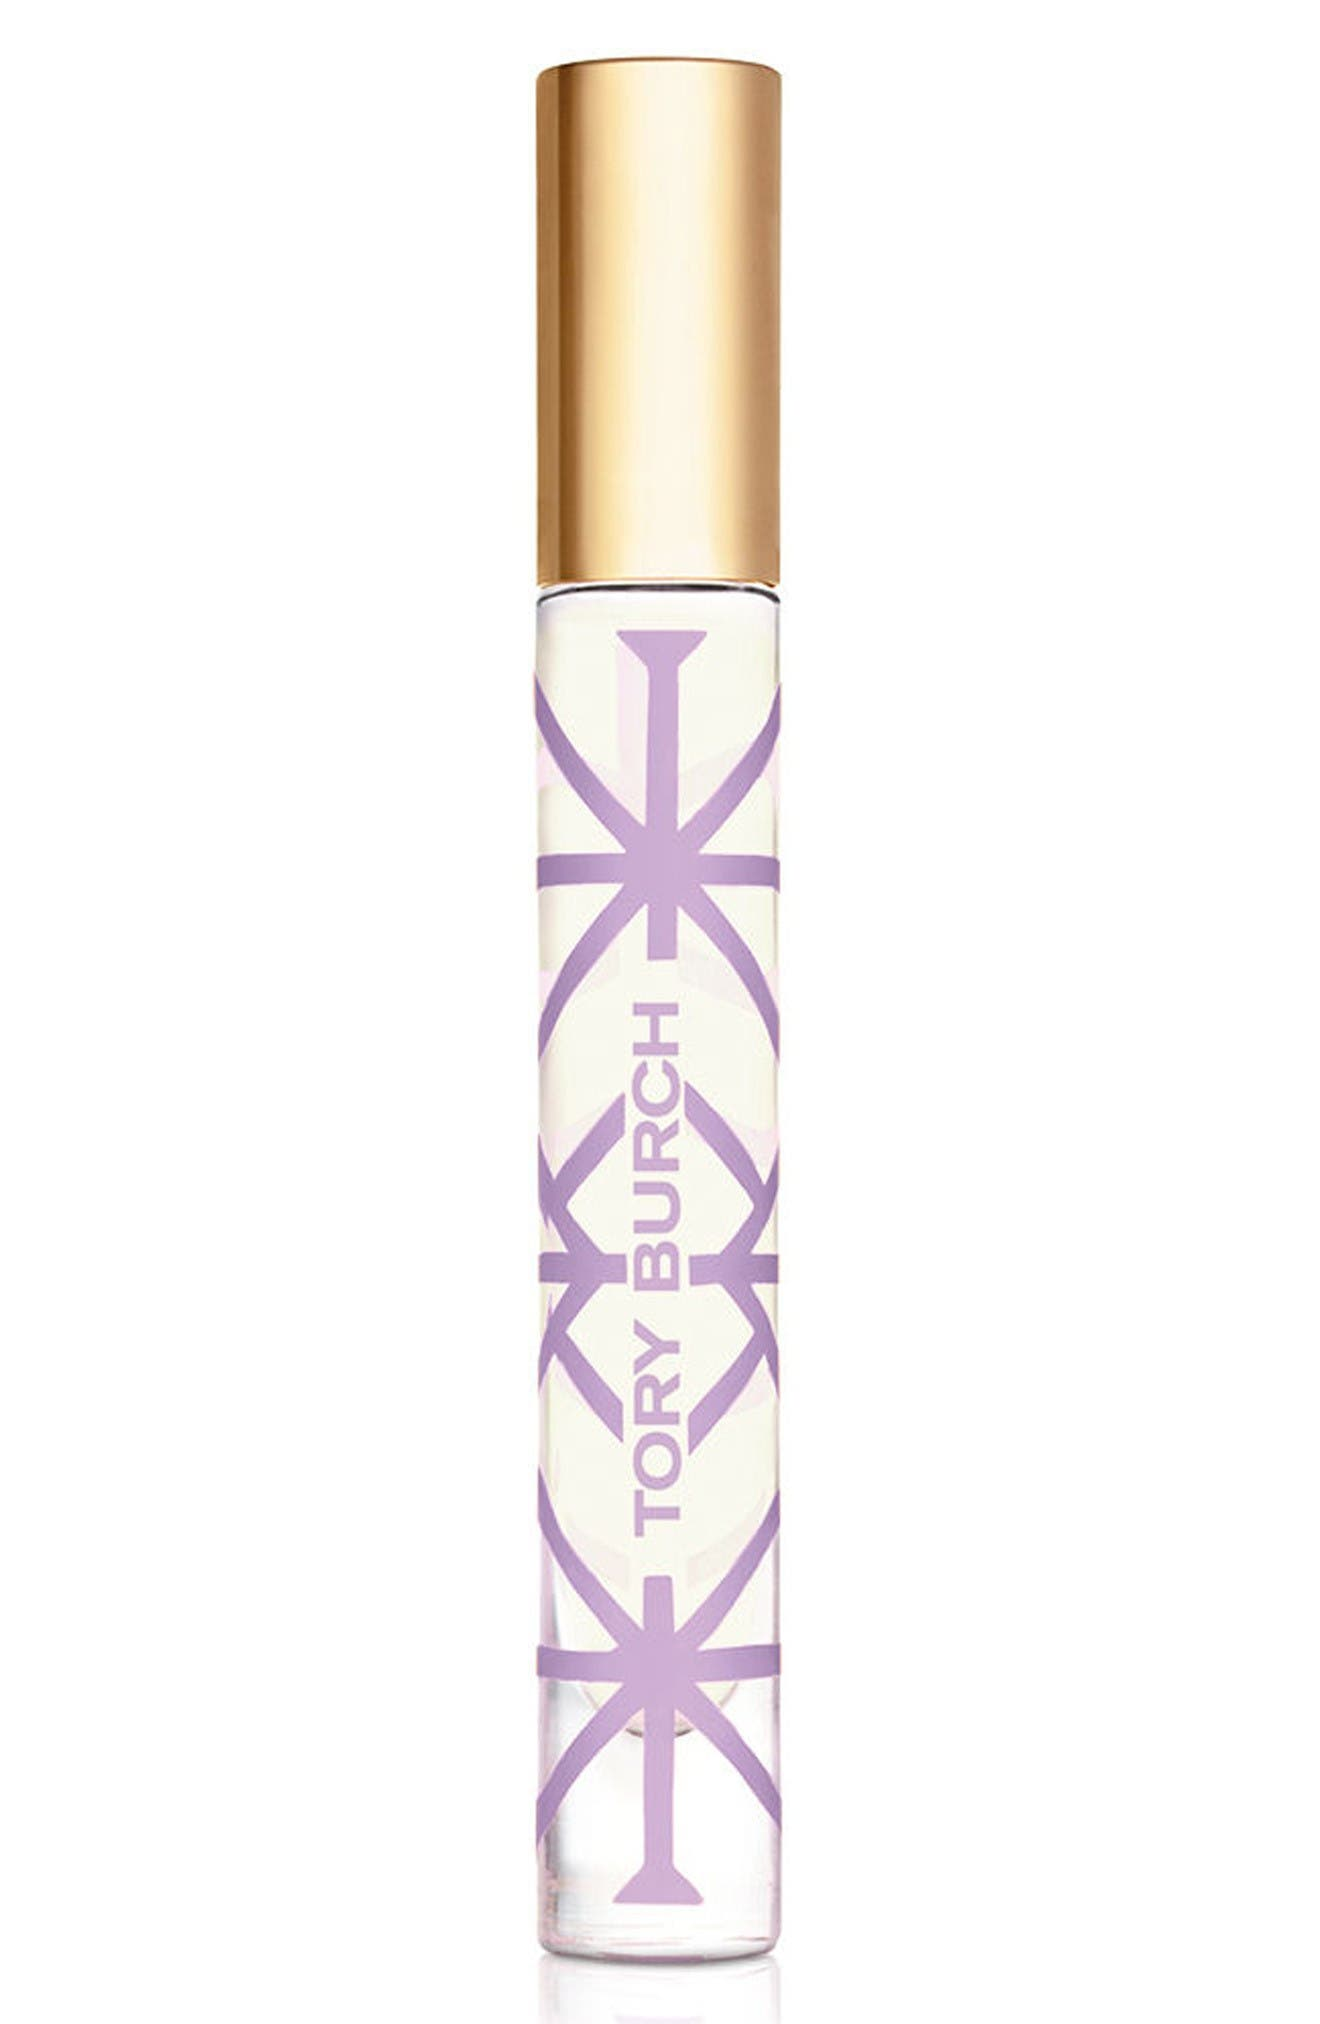 Tory Burch Jolie Fleur Lavande Eau de Parfum Rollerball